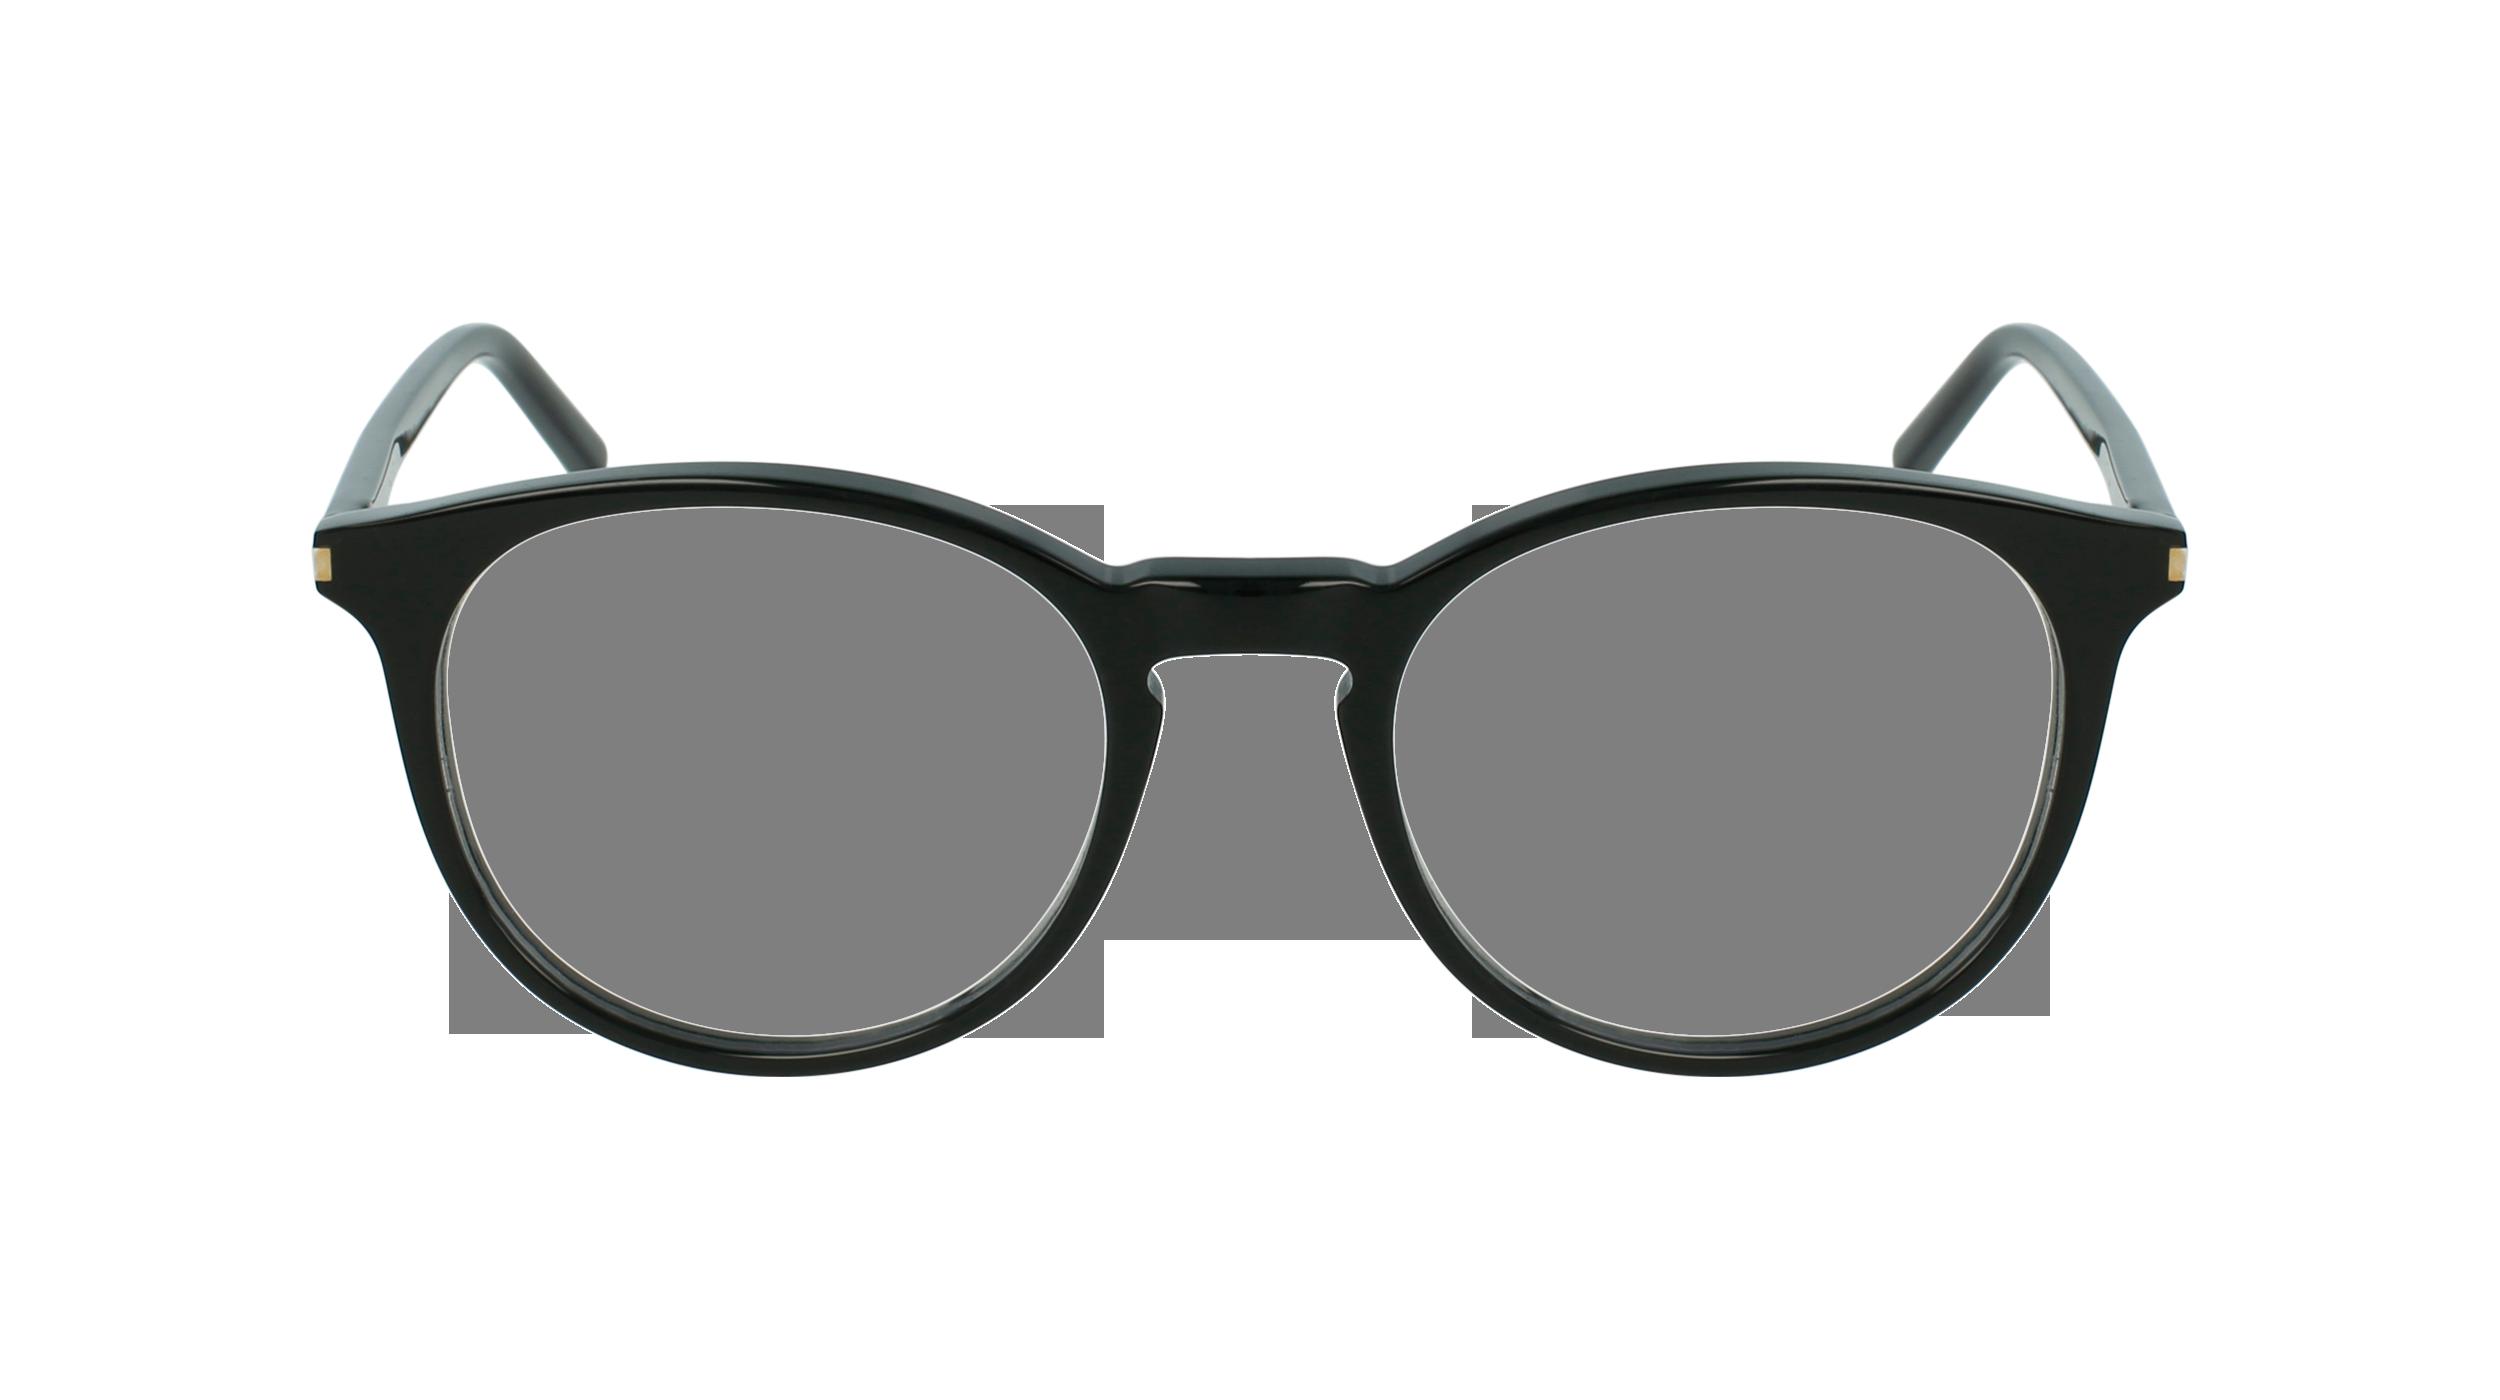 Optic2000 Lunettes Ysl Yves Saint Laurent